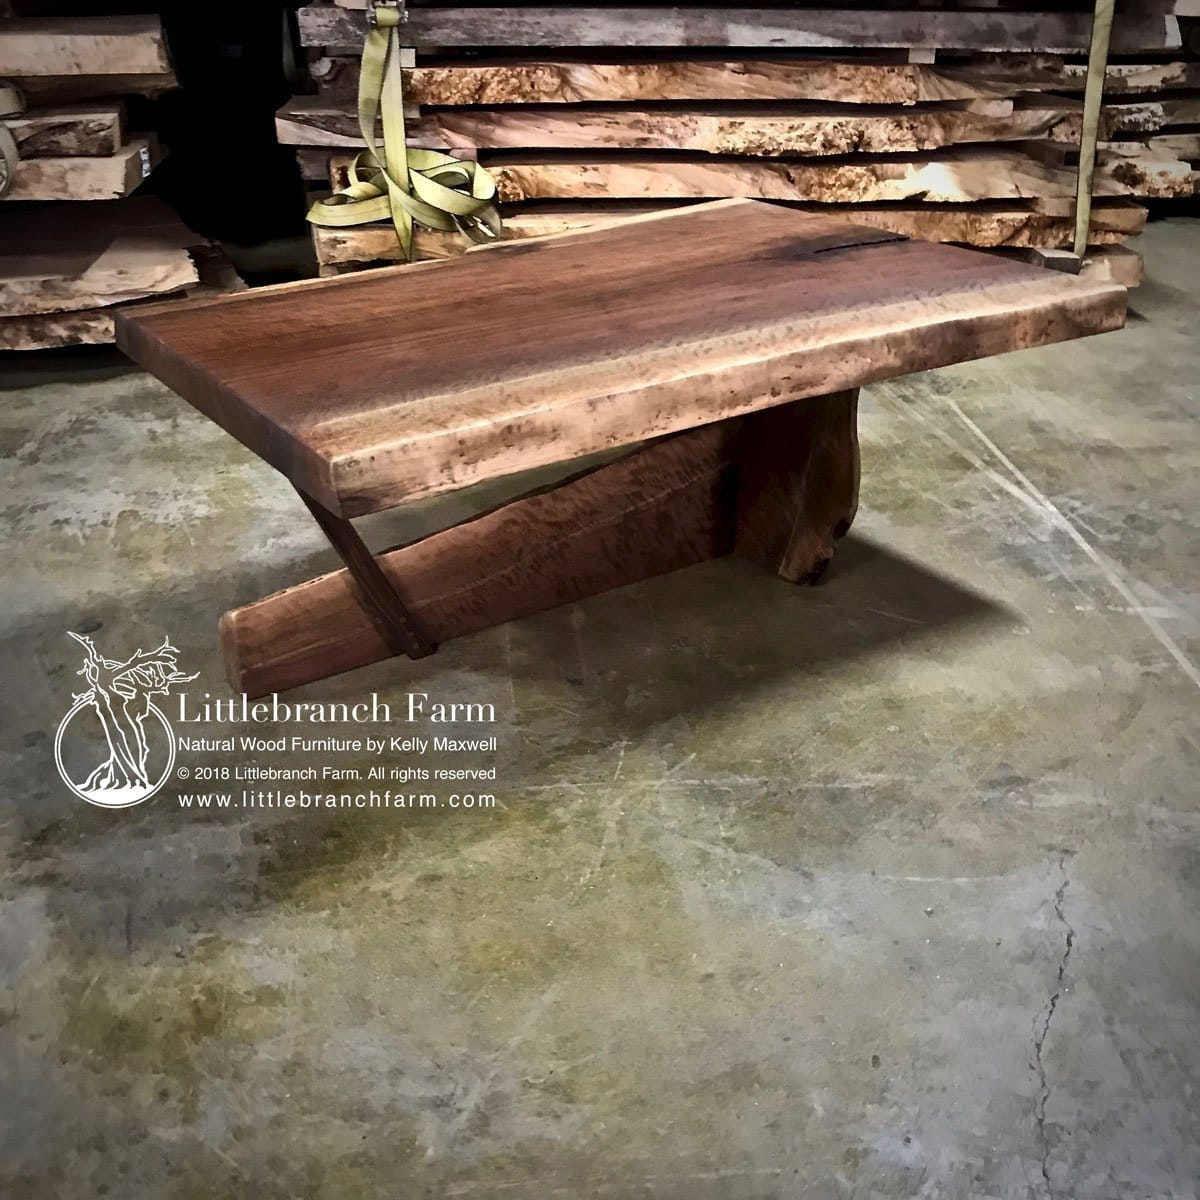 - Natural Wood Slab Coffee Table Littlebranch Farm